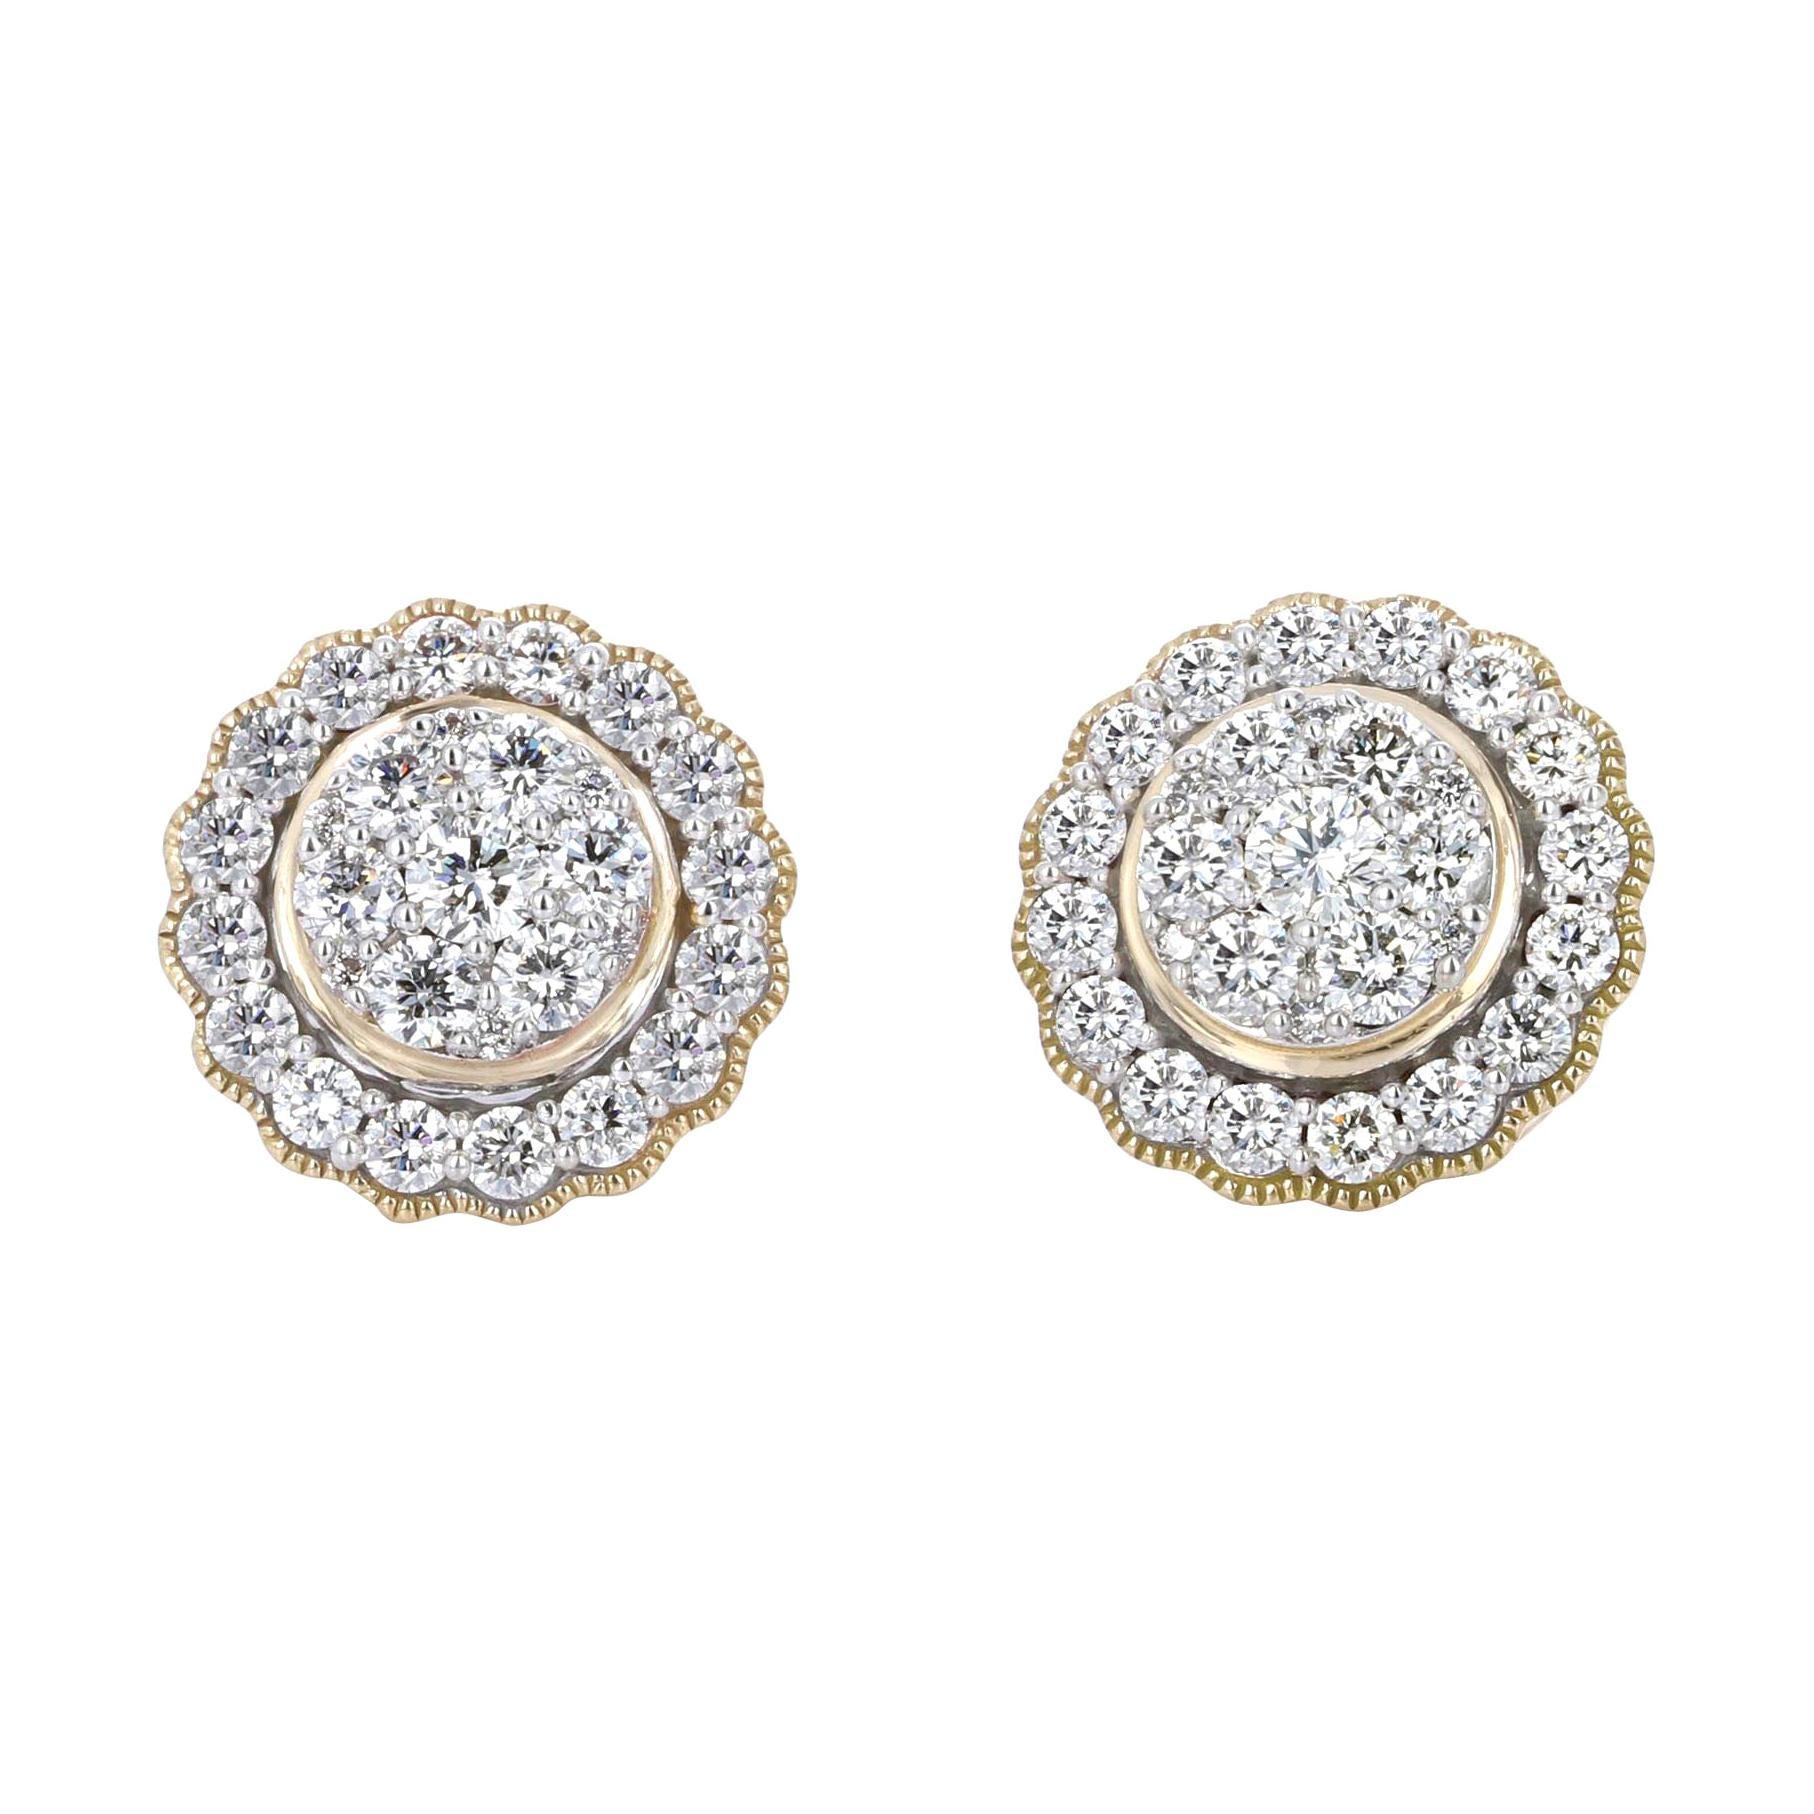 1.50 Carat Yellow Gold Diamond Cluster Stud Earrings